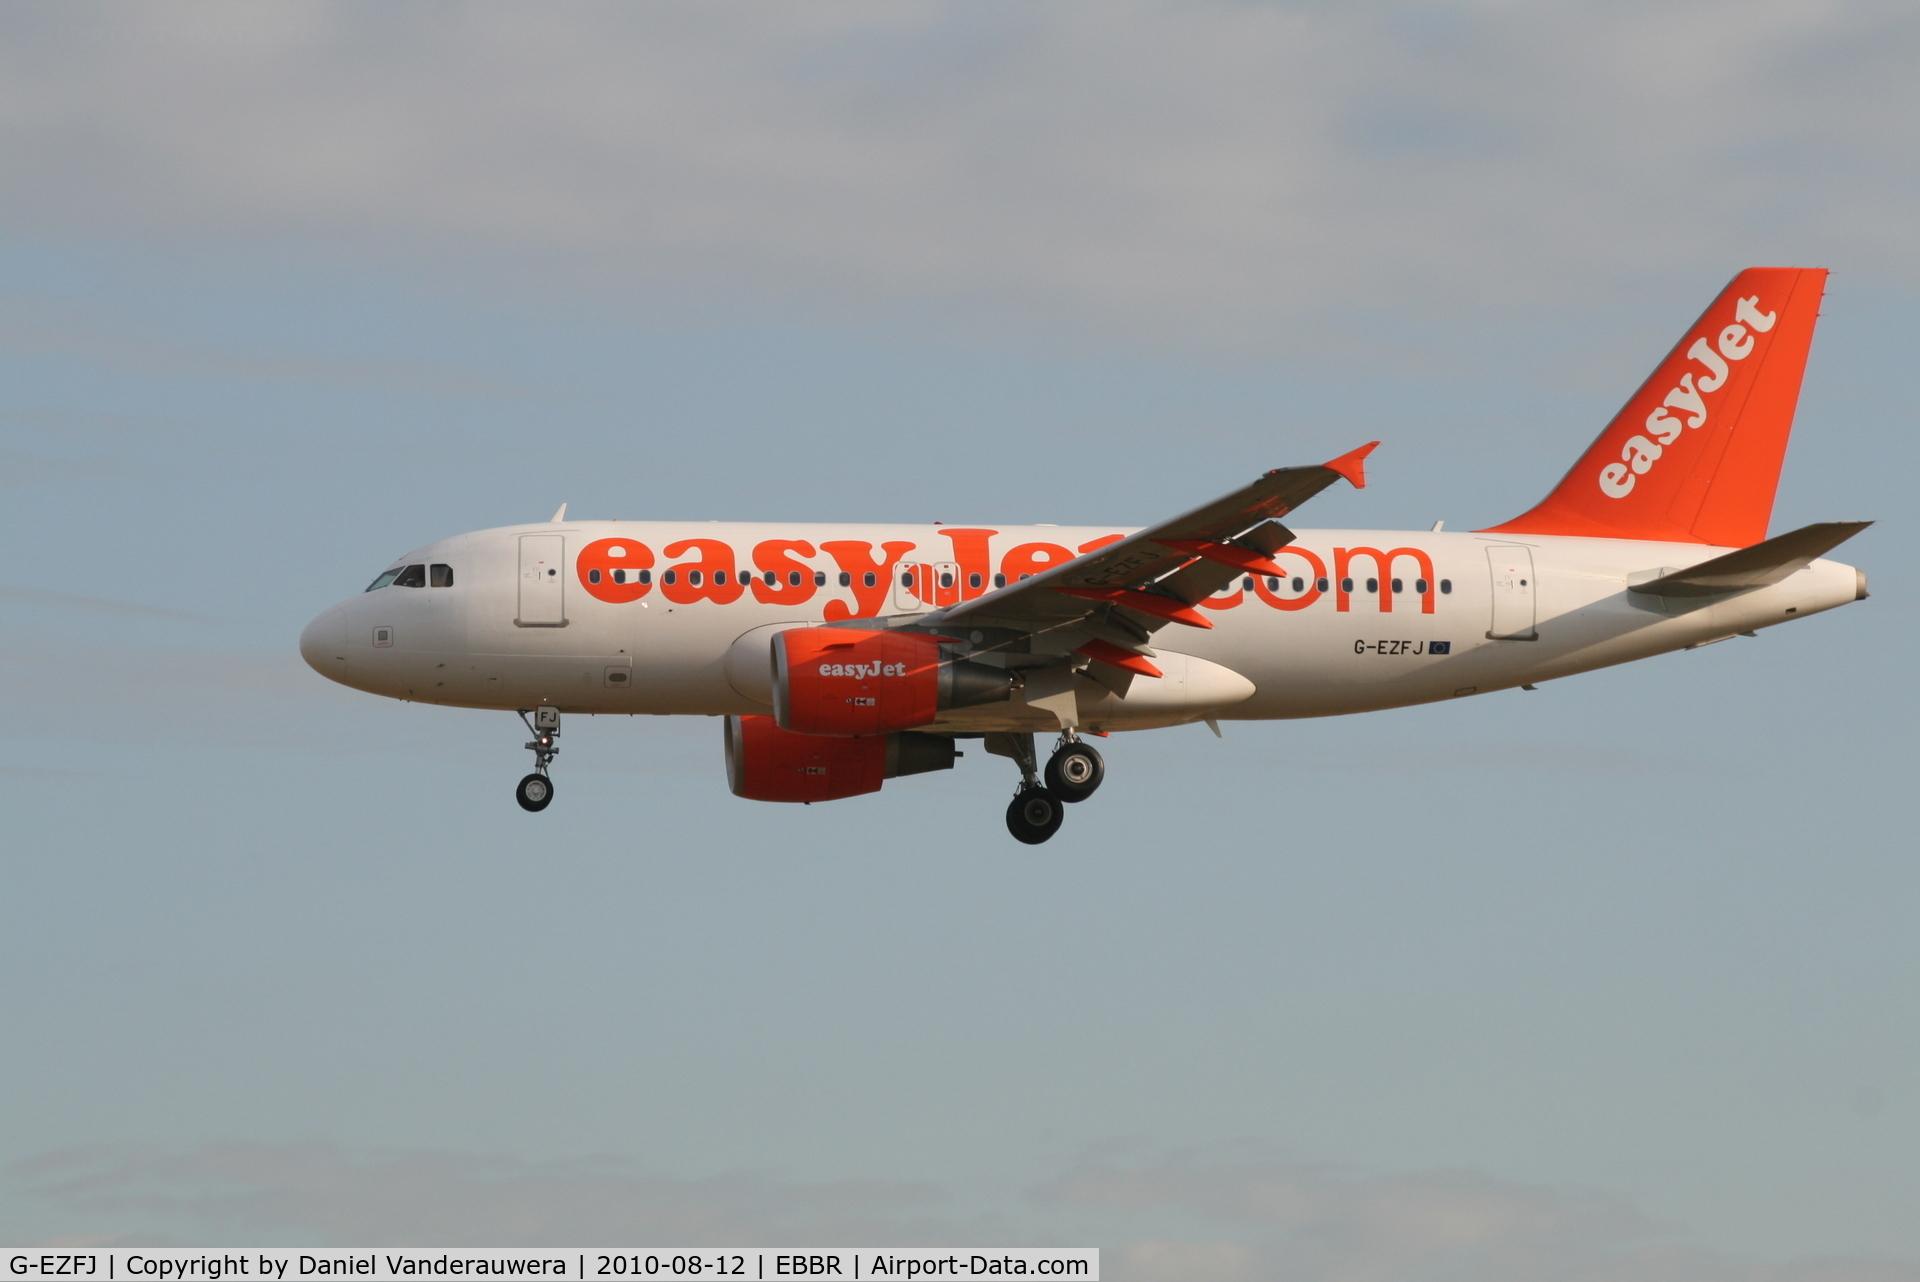 G-EZFJ, 2009 Airbus A319-111 C/N 4040, Arrival of flight EZY4701 to RWY 25L